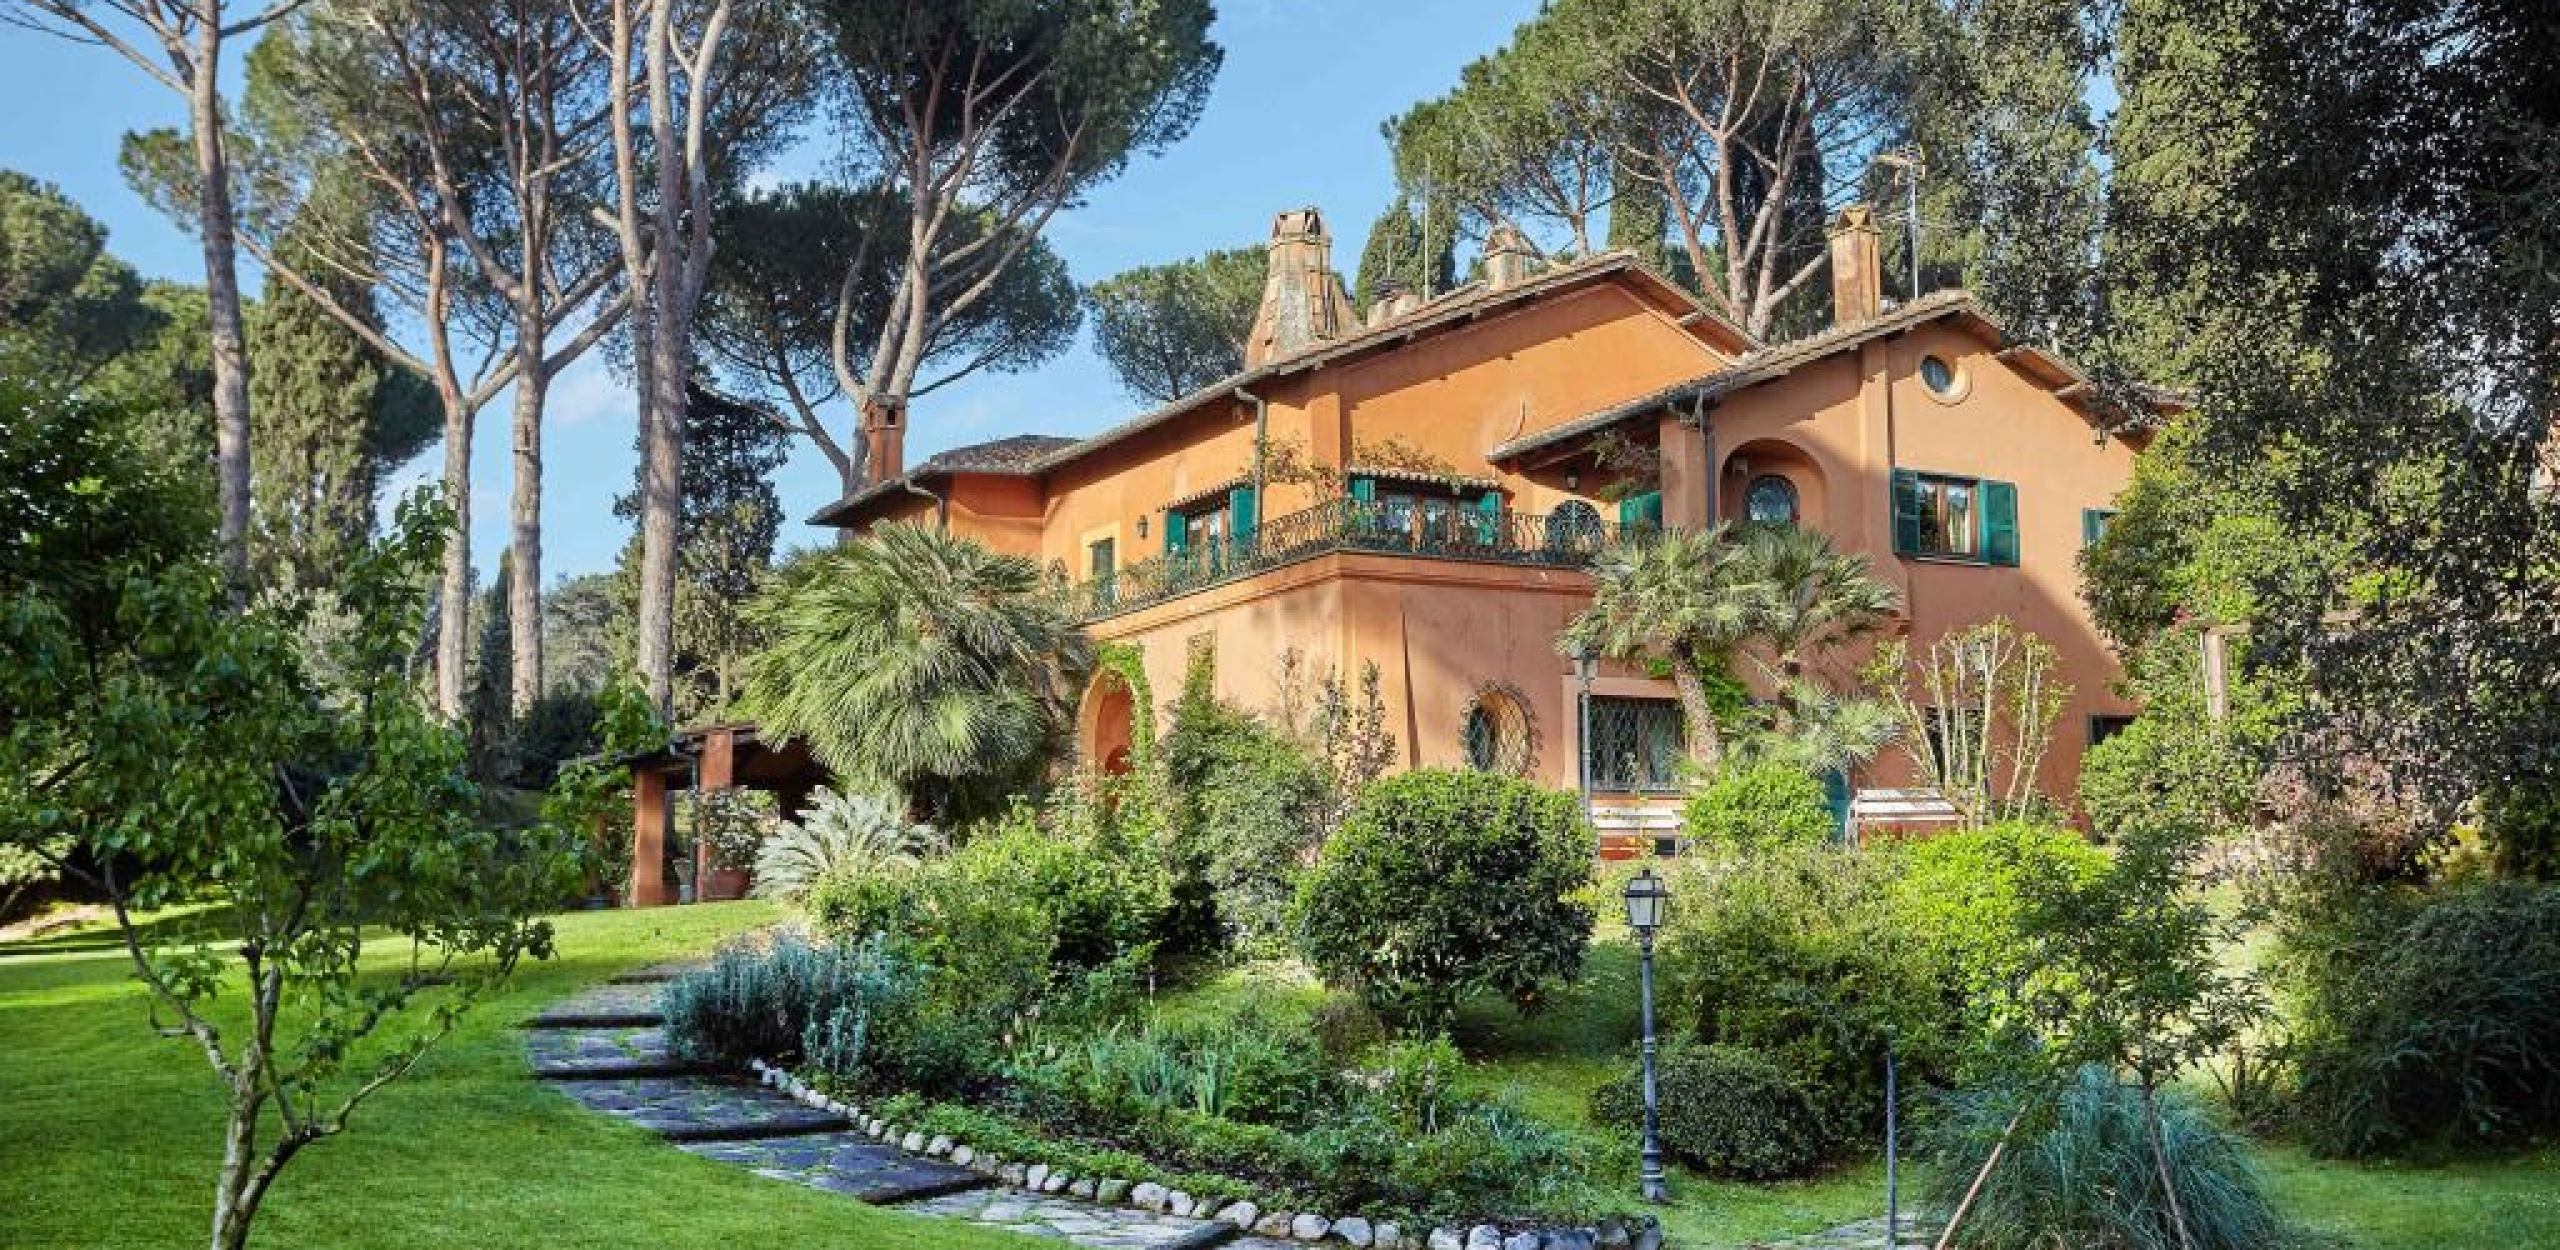 000.Villa Caetana . Ext